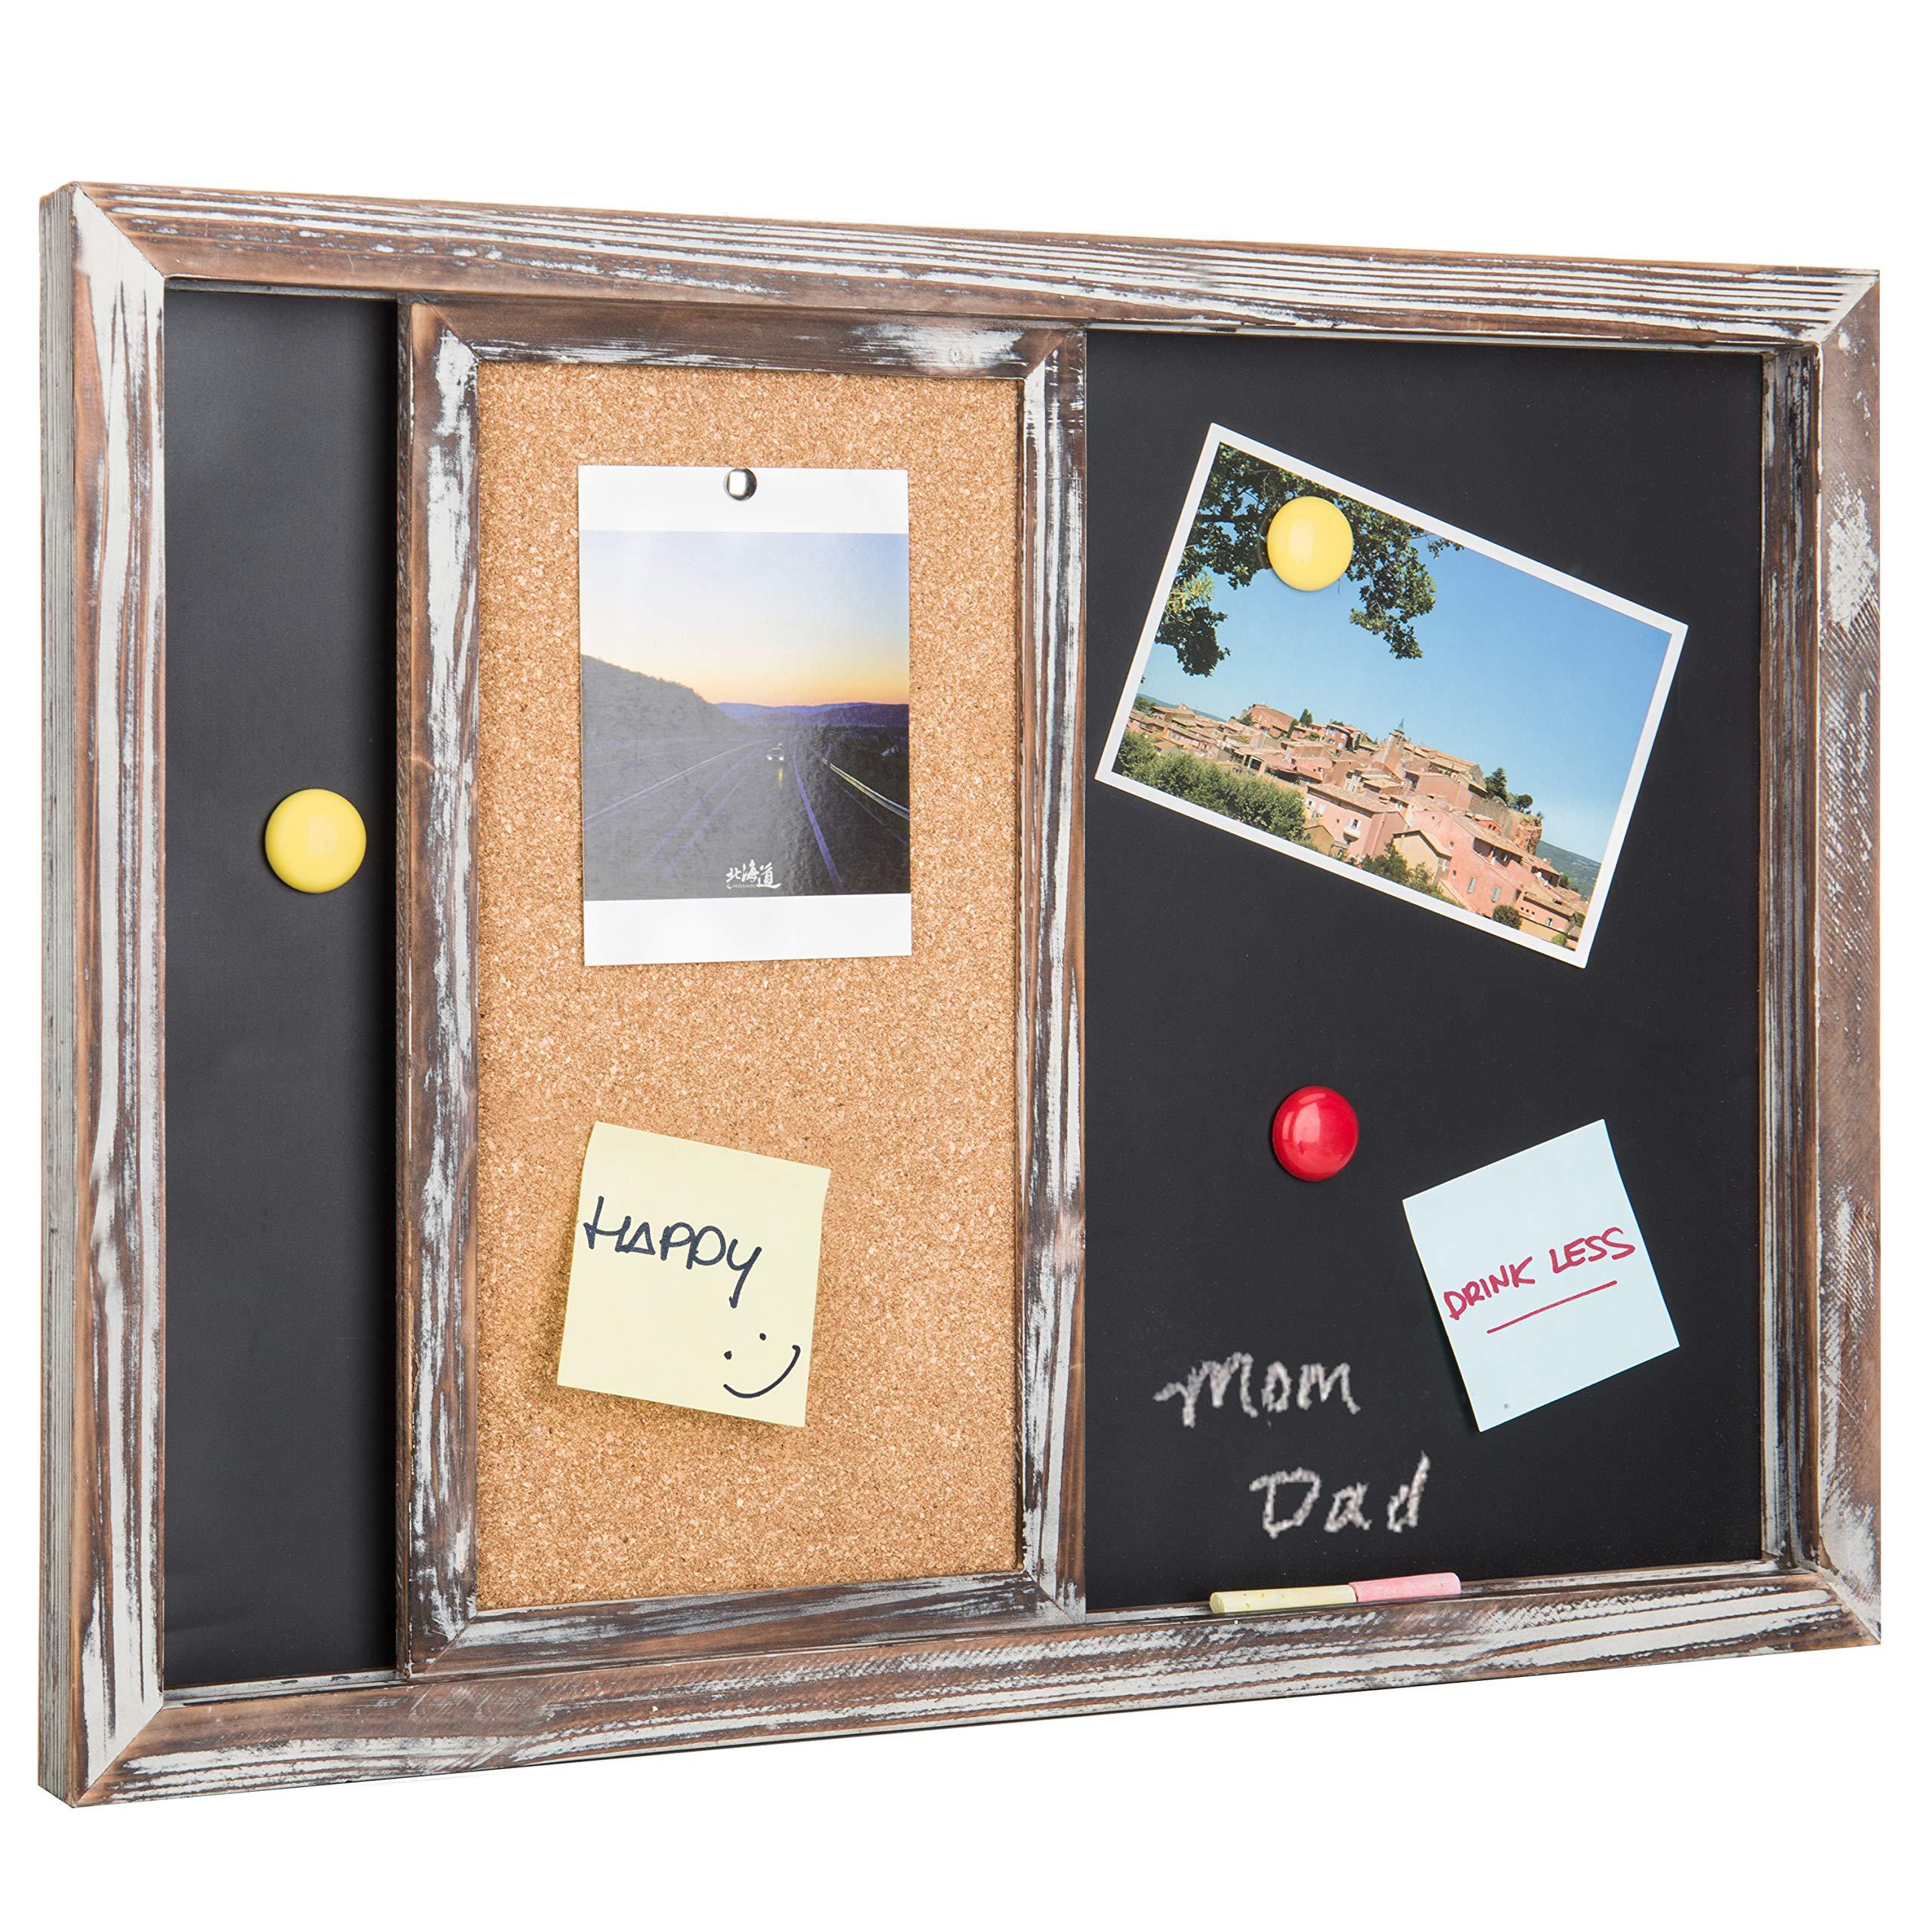 MyGift Rustic Gray Wood Wall-Mounted Magnetic Chalkboard & Sliding Cork Board